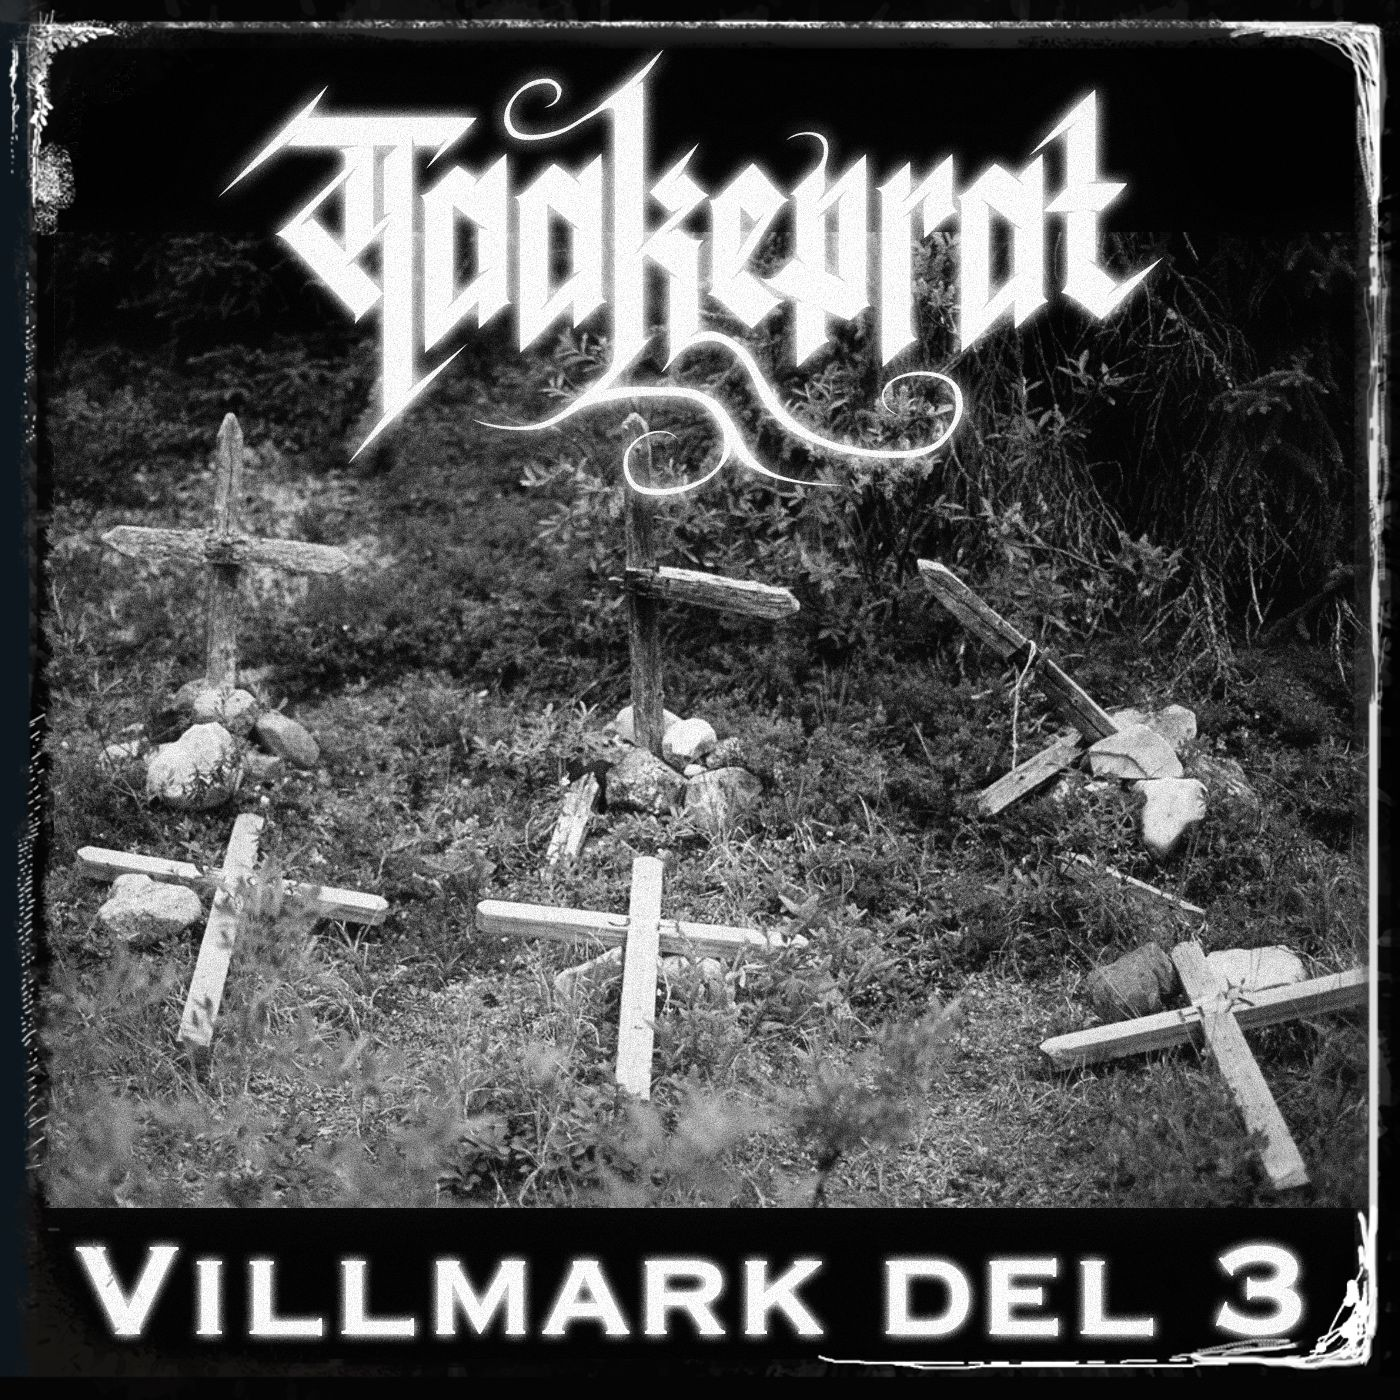 Episode 123 - Villmark del 3